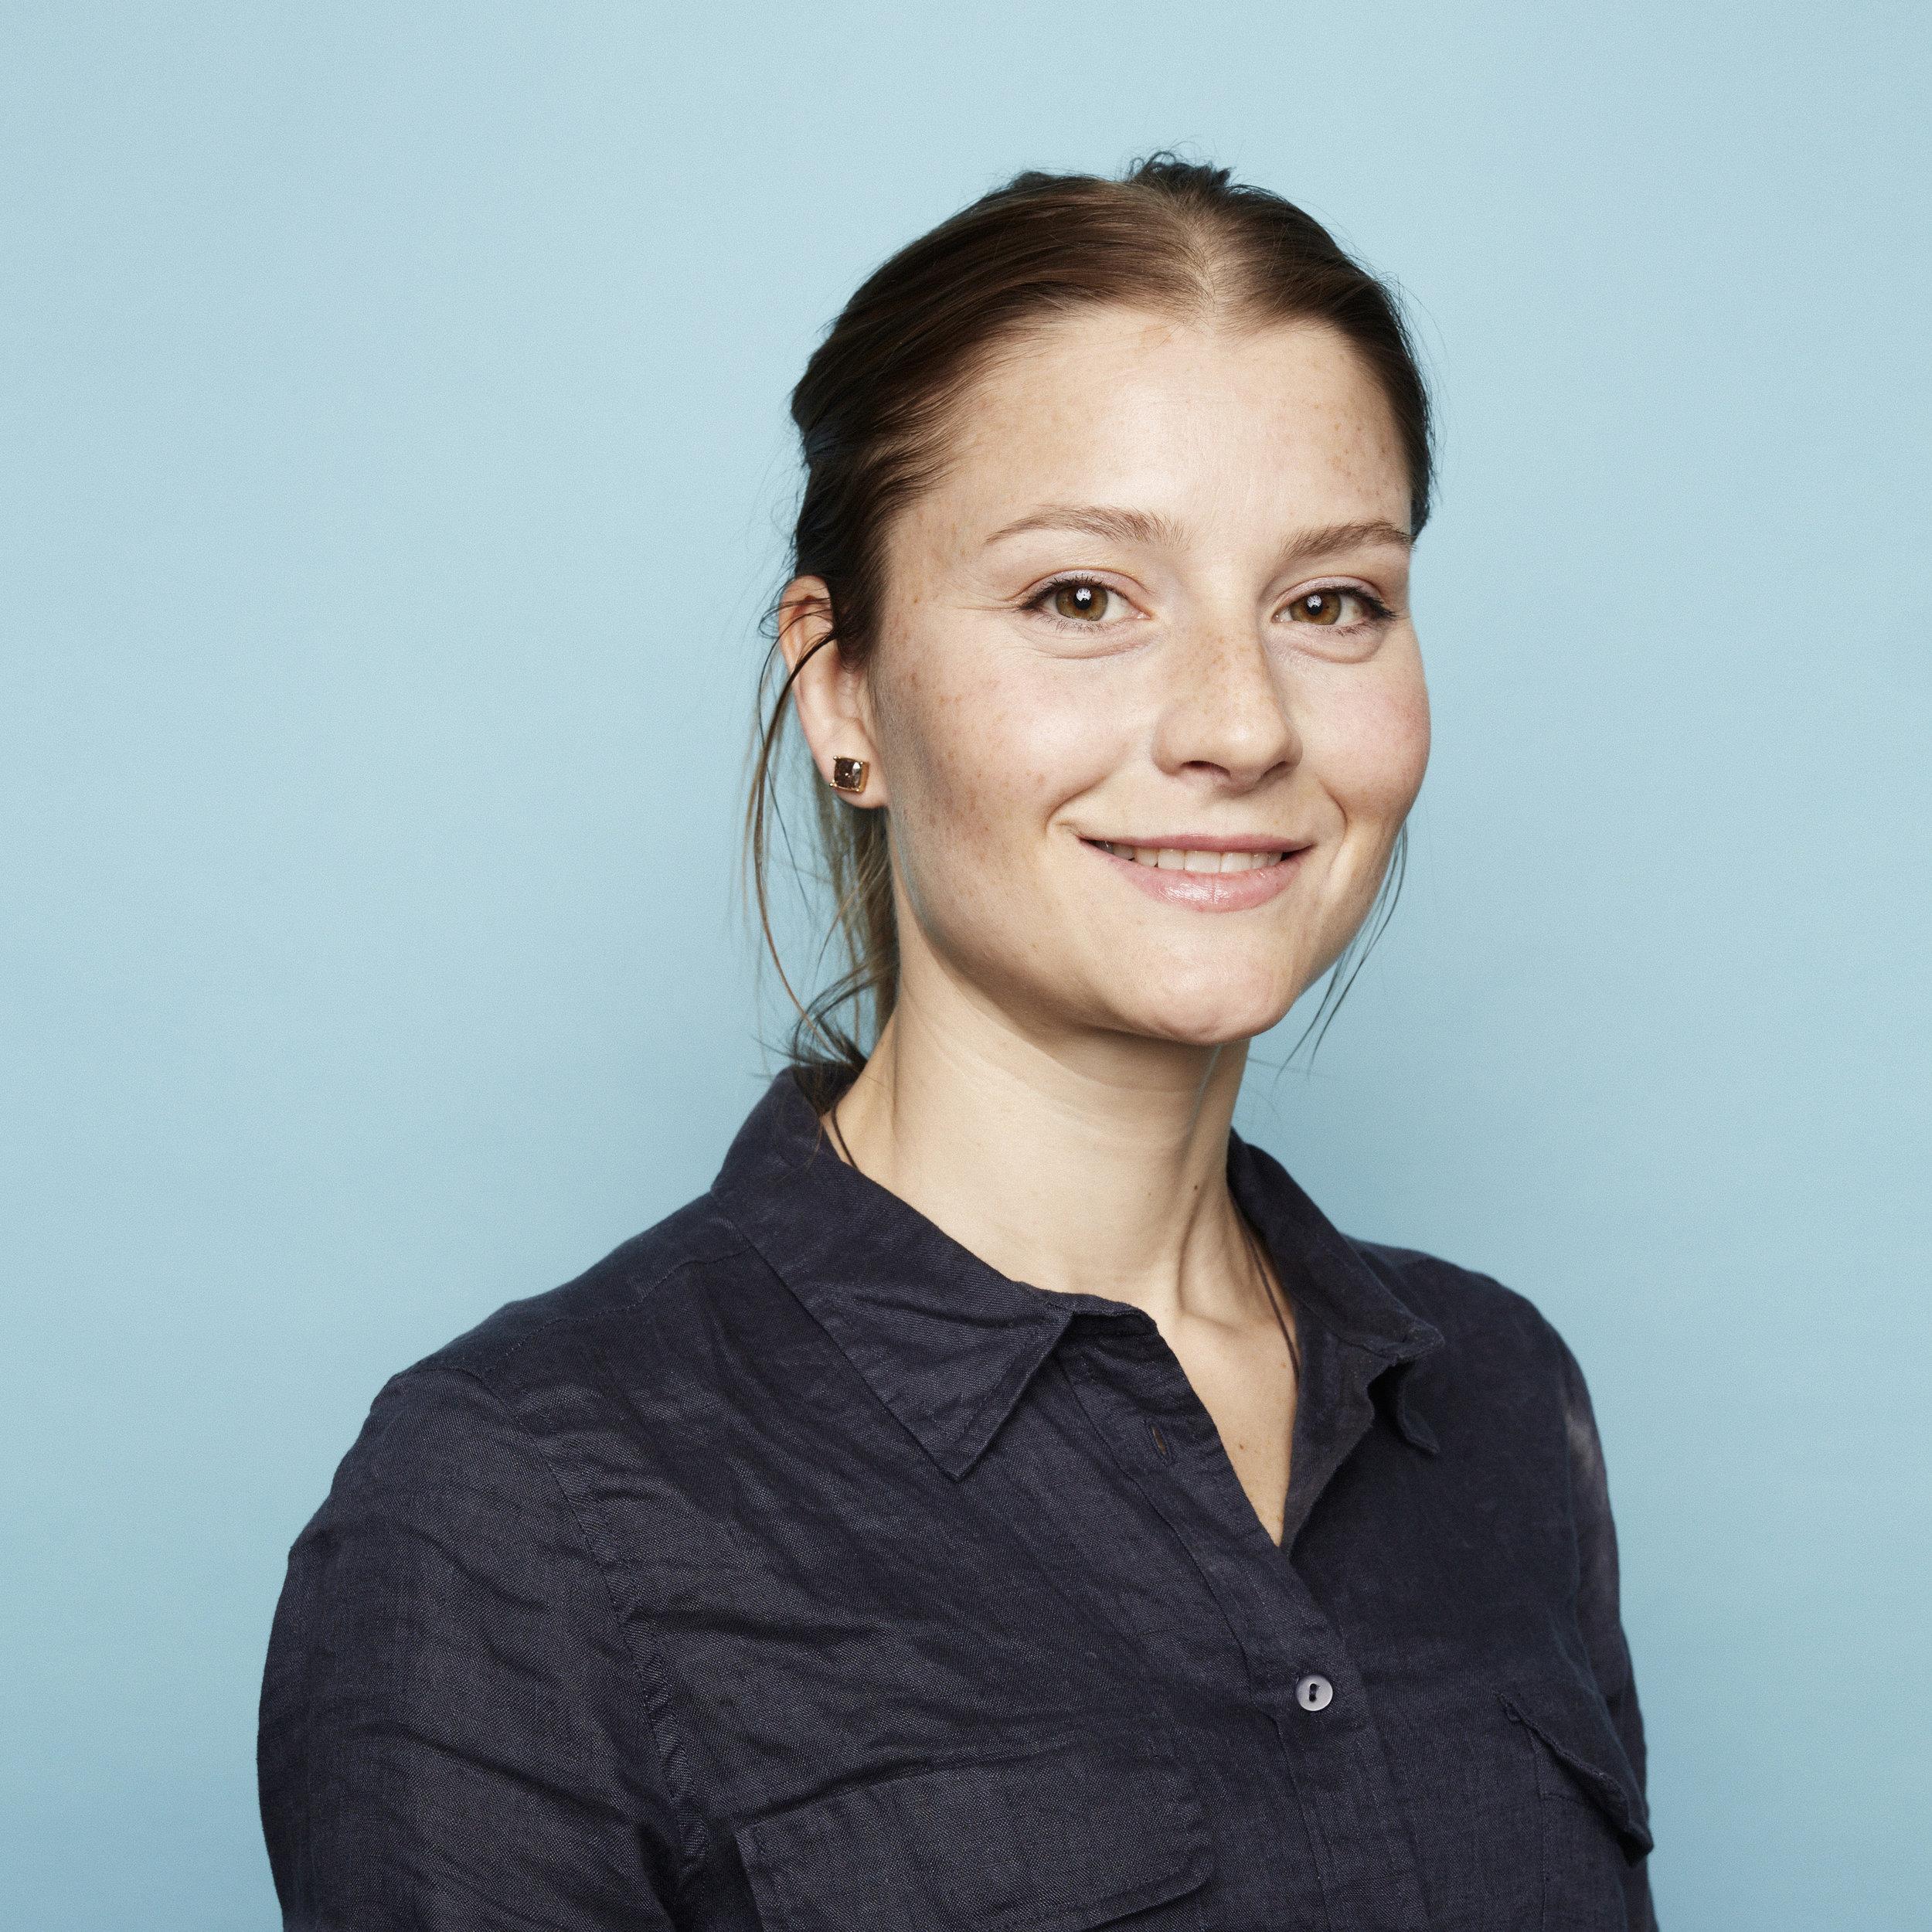 NINA HELENE GJERSØE  Sivilarkitekt / Master i arkitektur  nhg@archus.no  tlf: 458 07 912